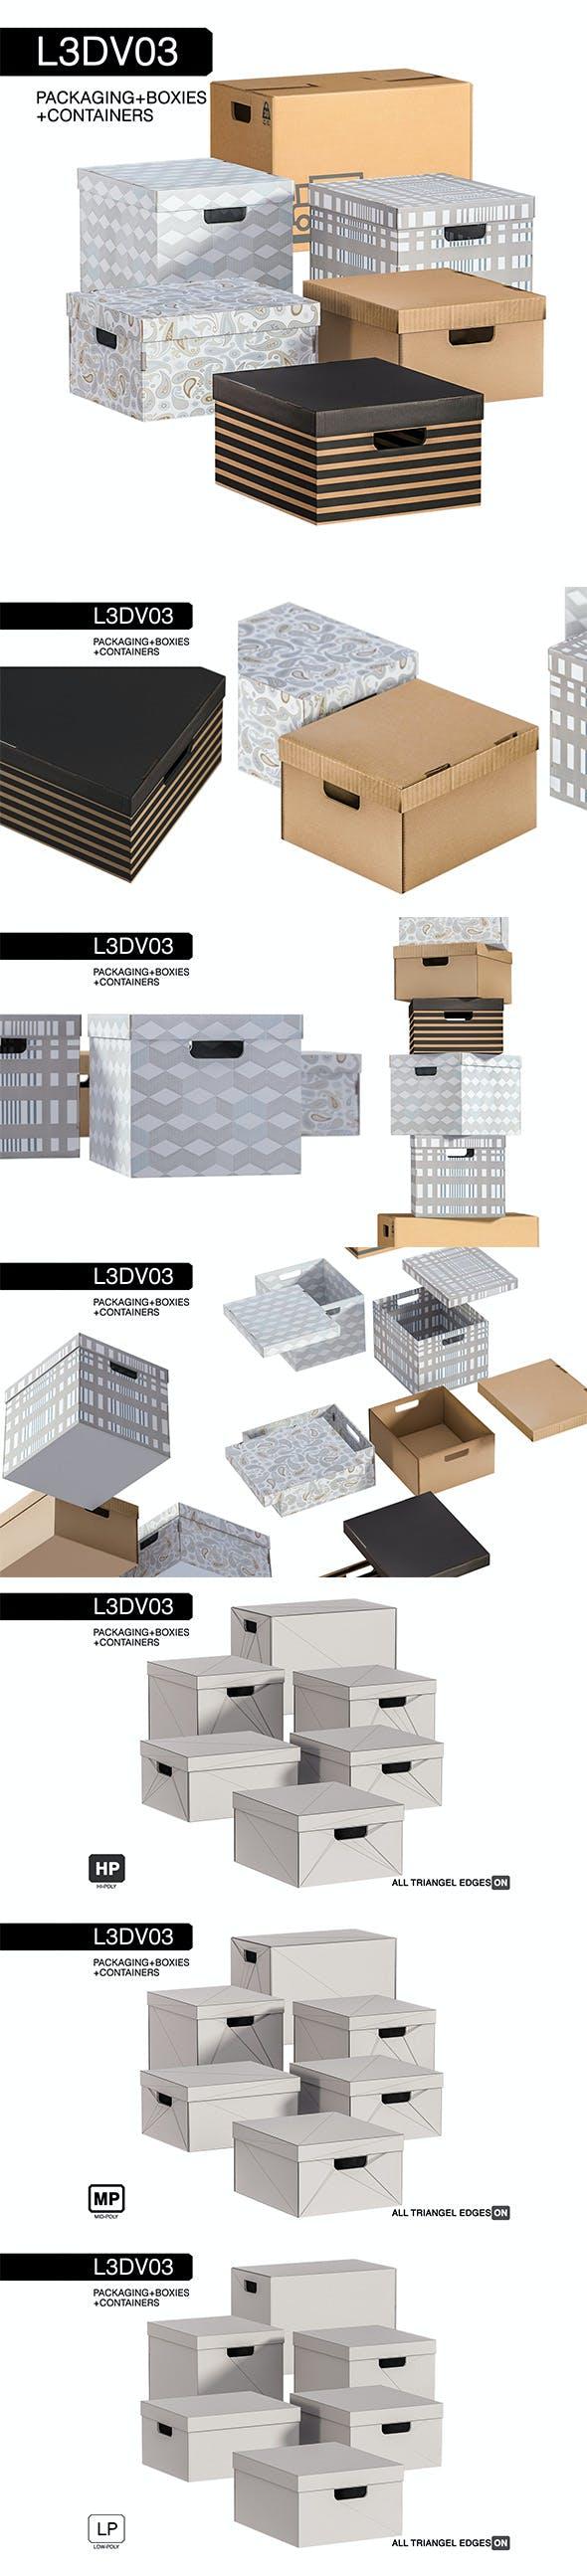 L3DV03G02 - boxes set - 3DOcean Item for Sale